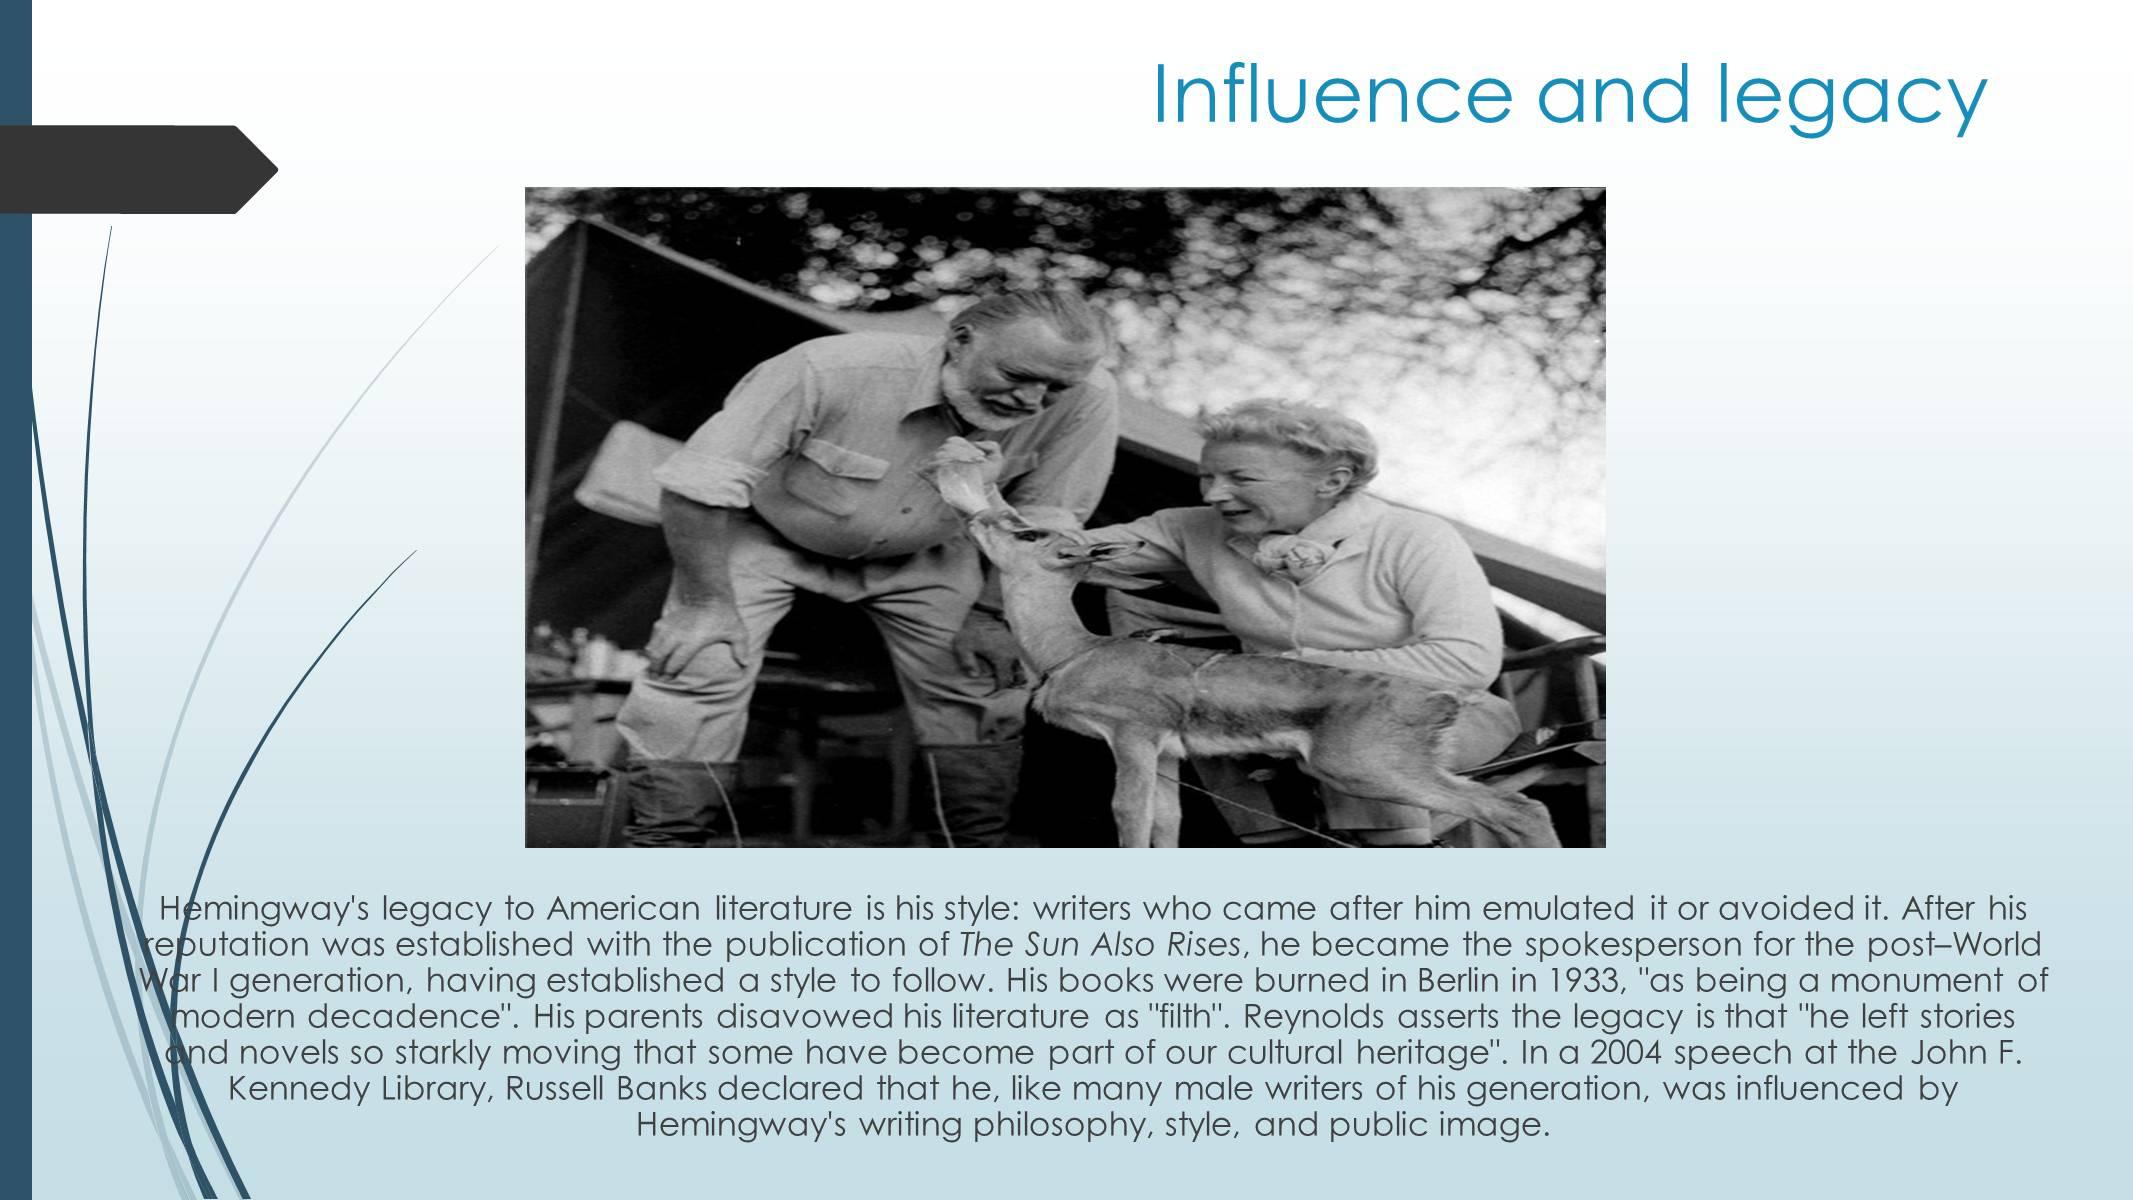 ernest hemingway a legacy for american